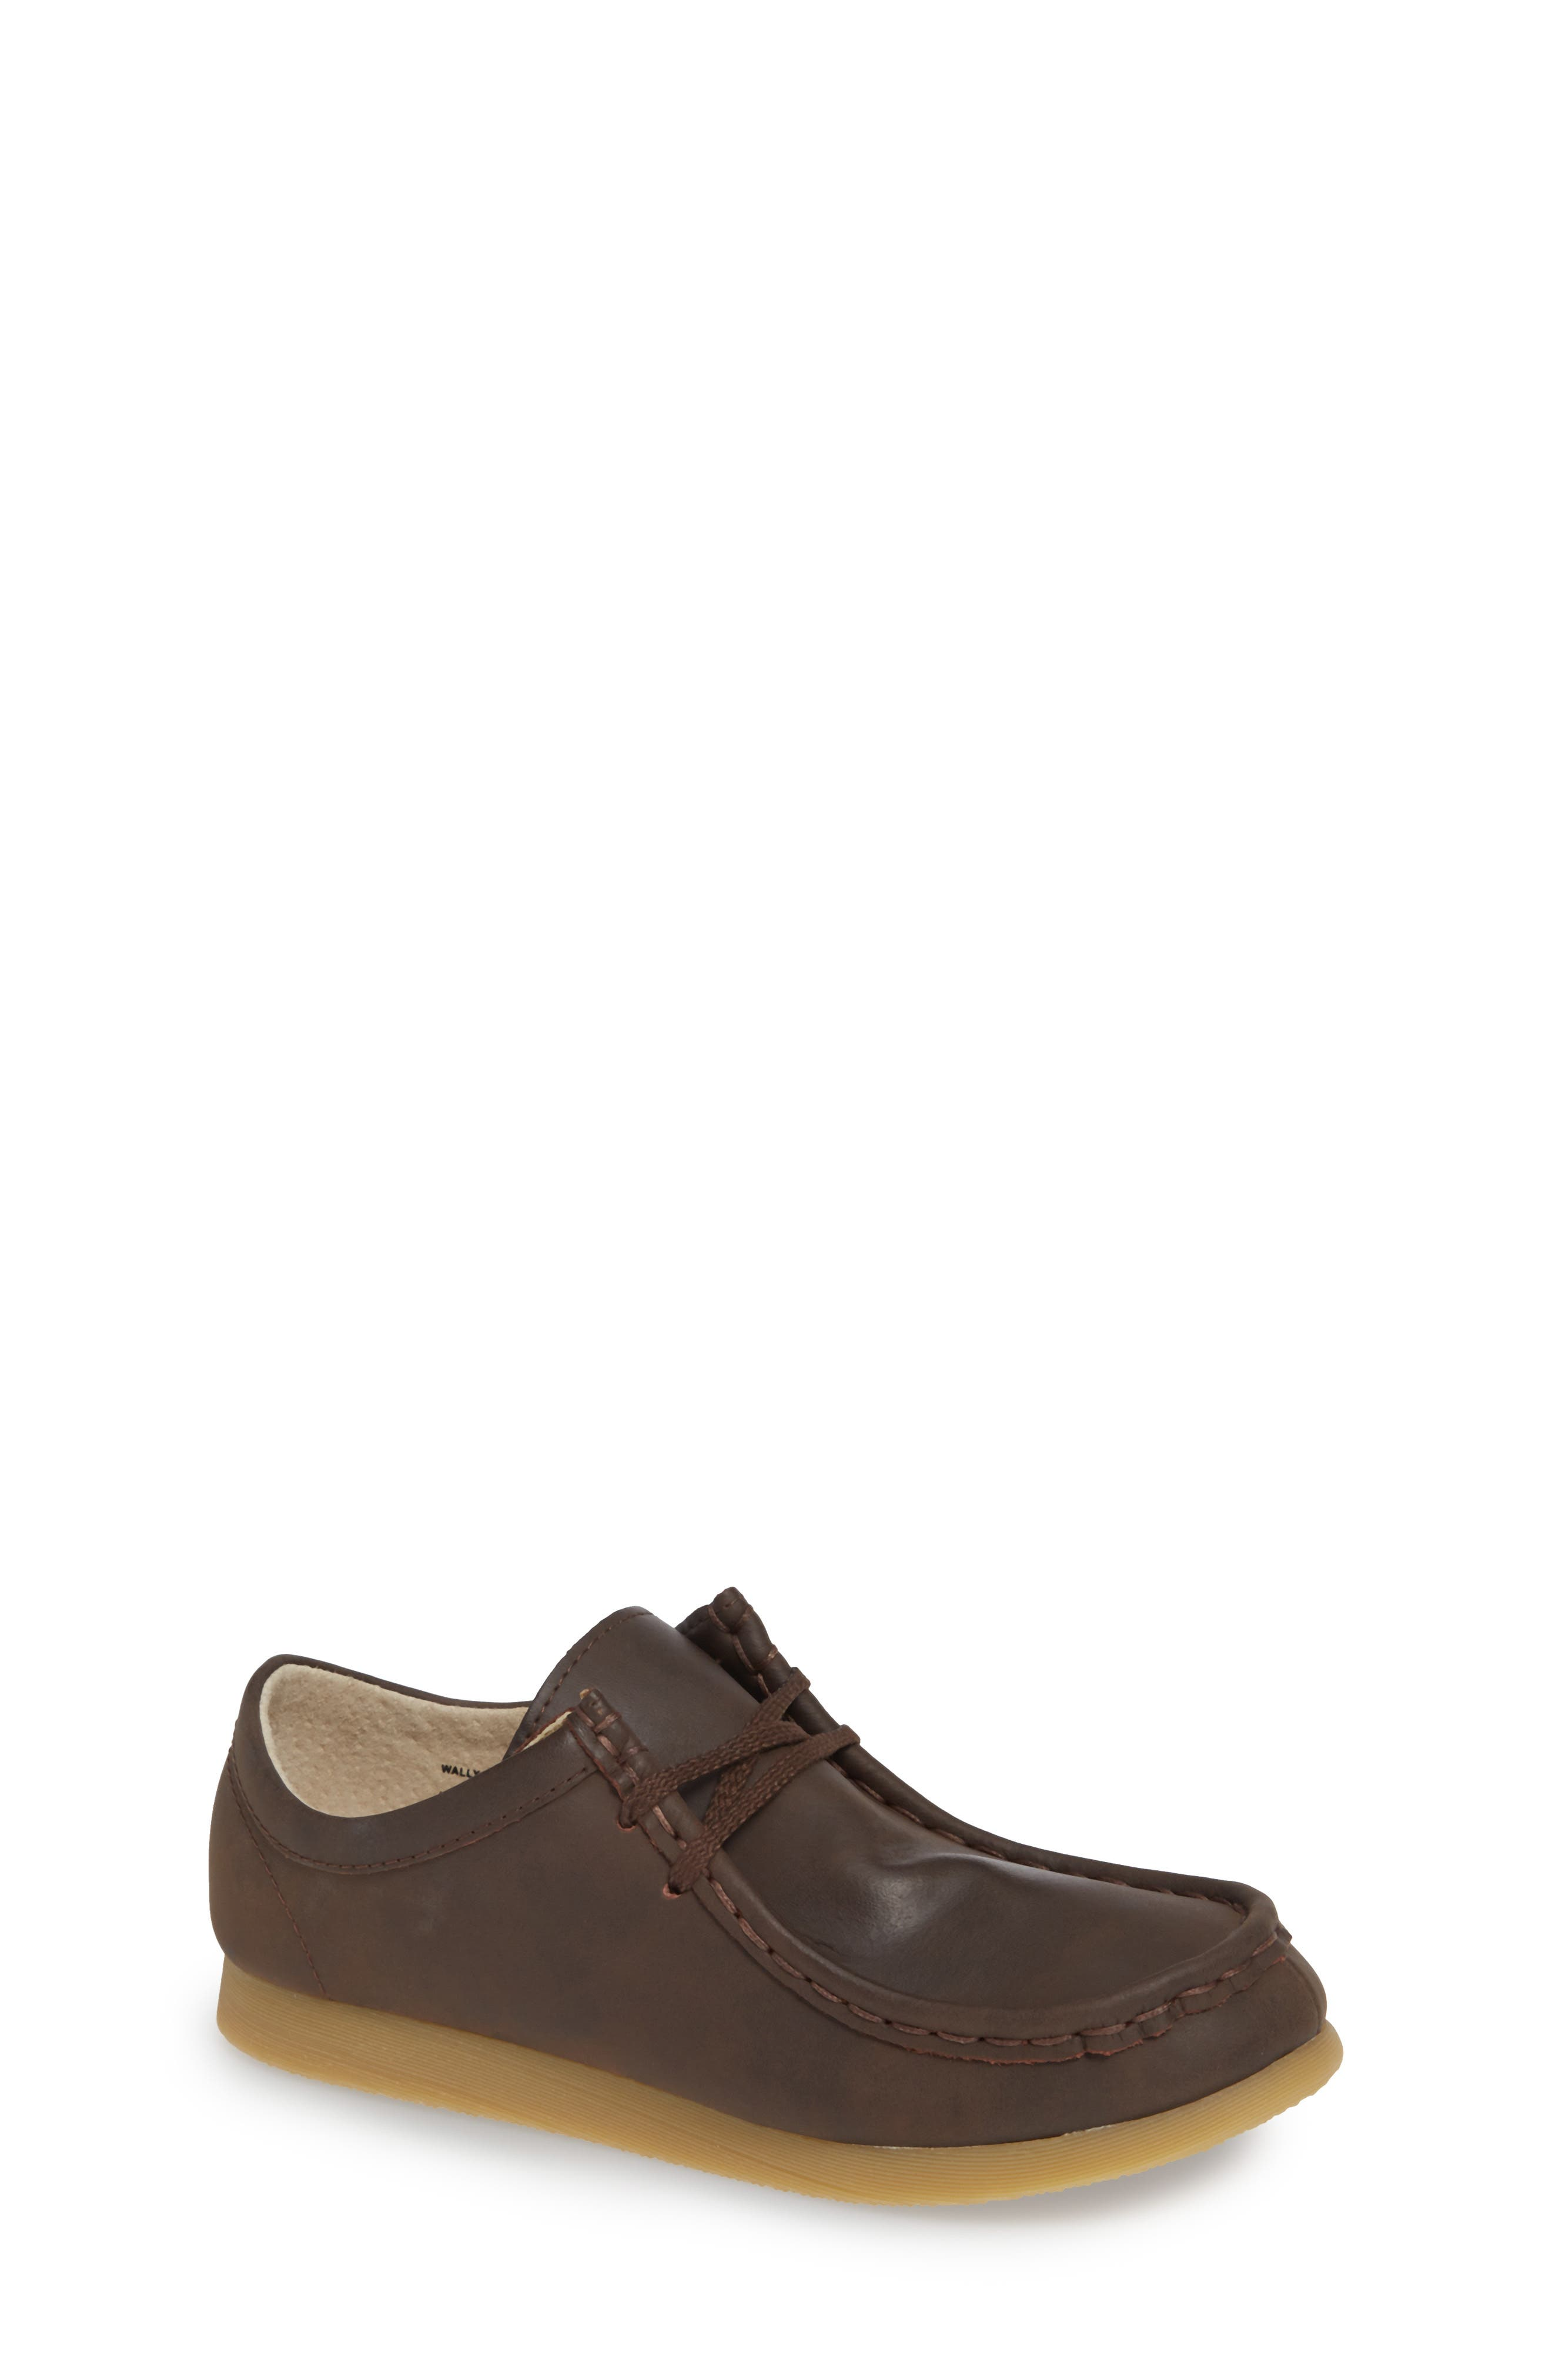 FOOTMATES Wally Low Chukka Boot, Main, color, BROWN OILED